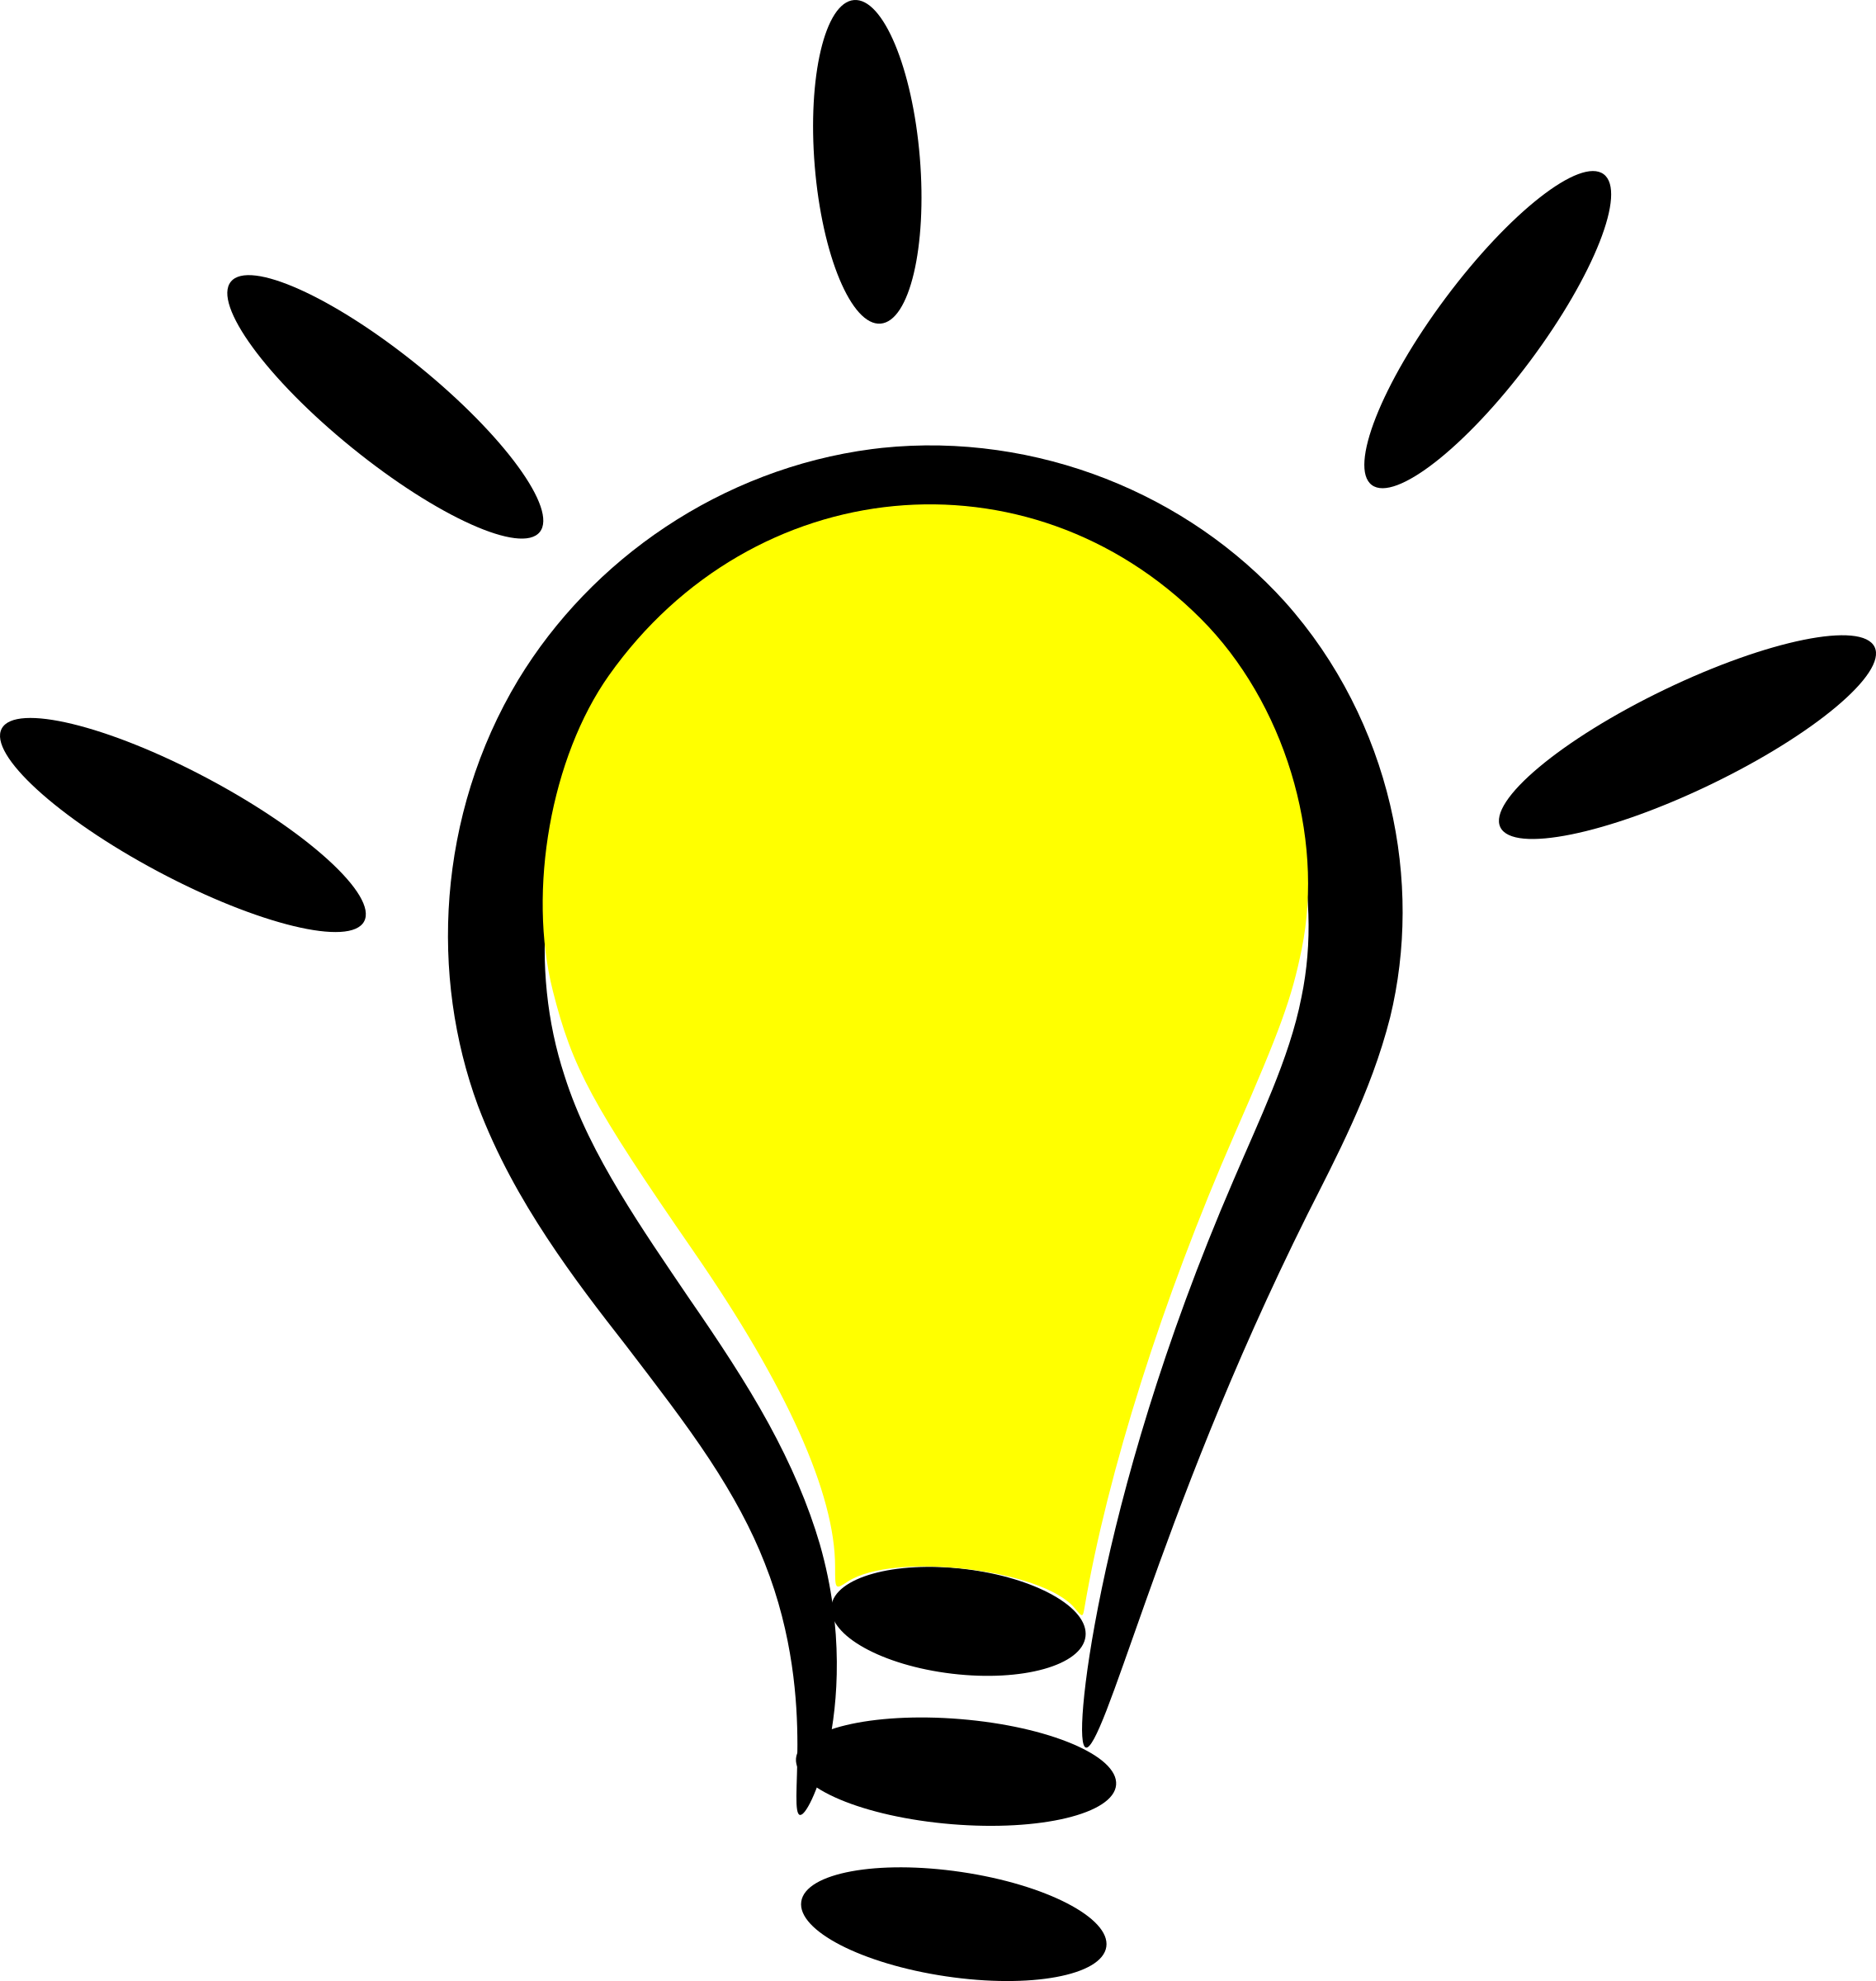 Free light bulb clip art pictures